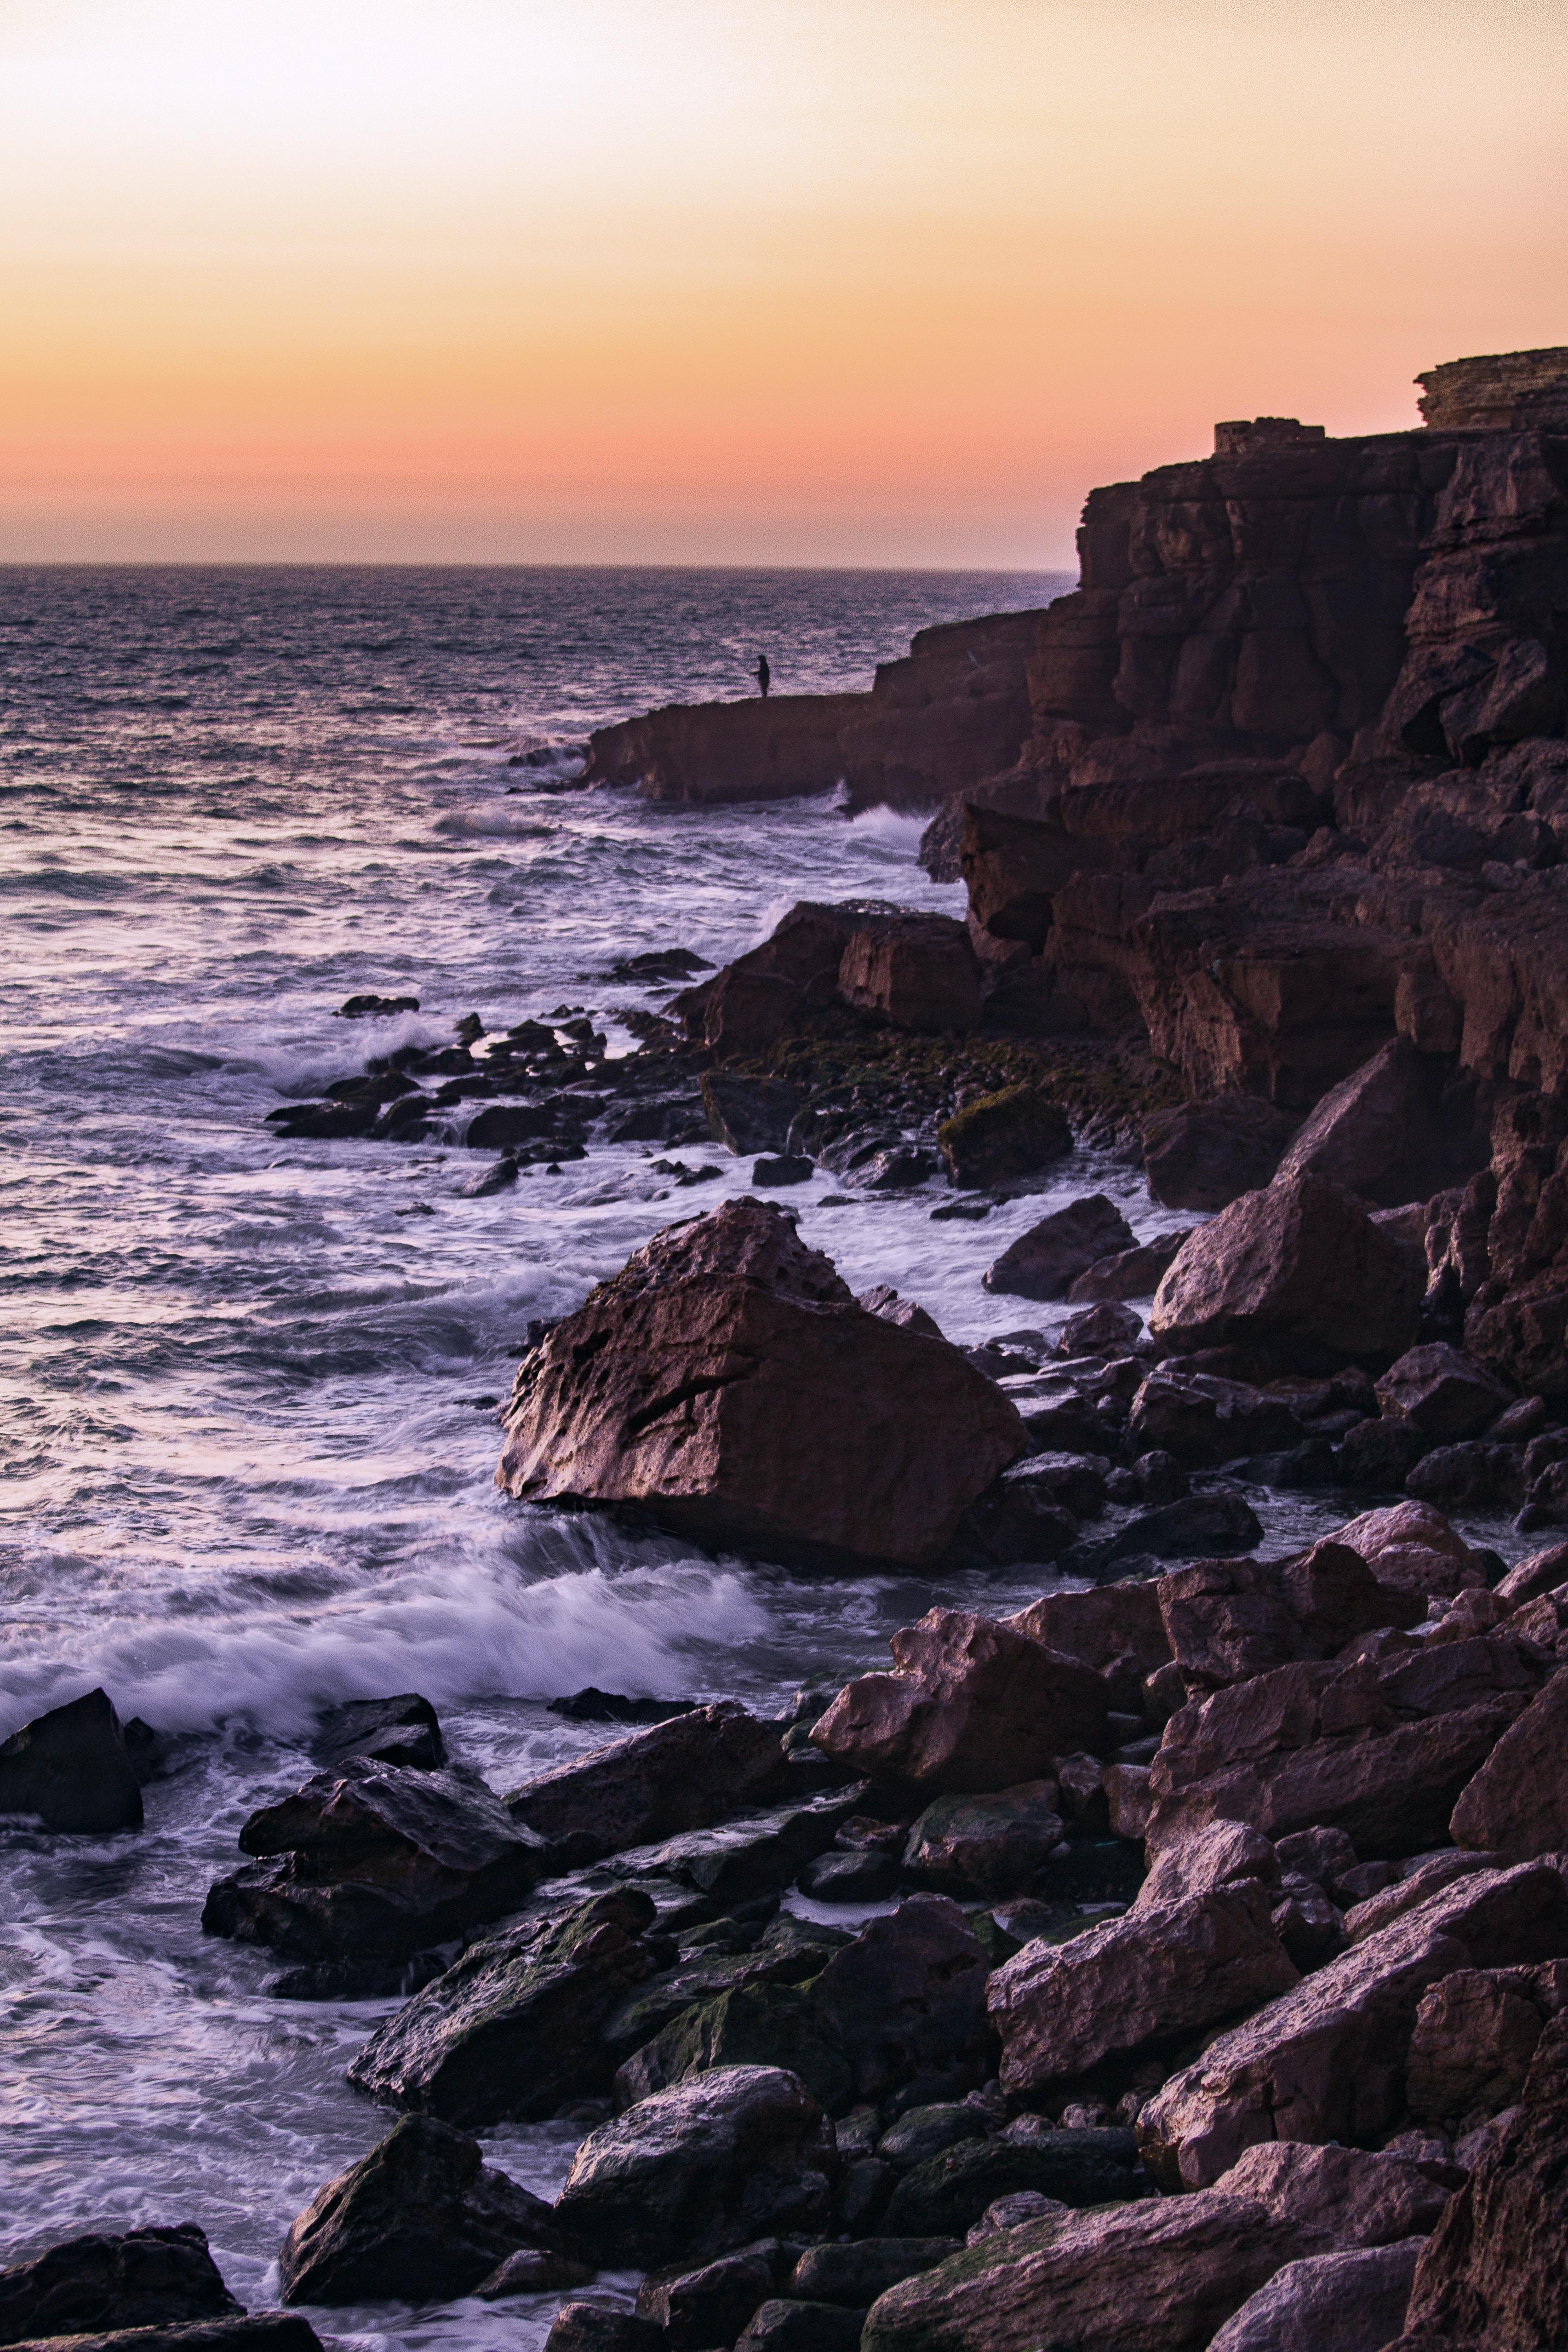 rocks near sea during golden hour